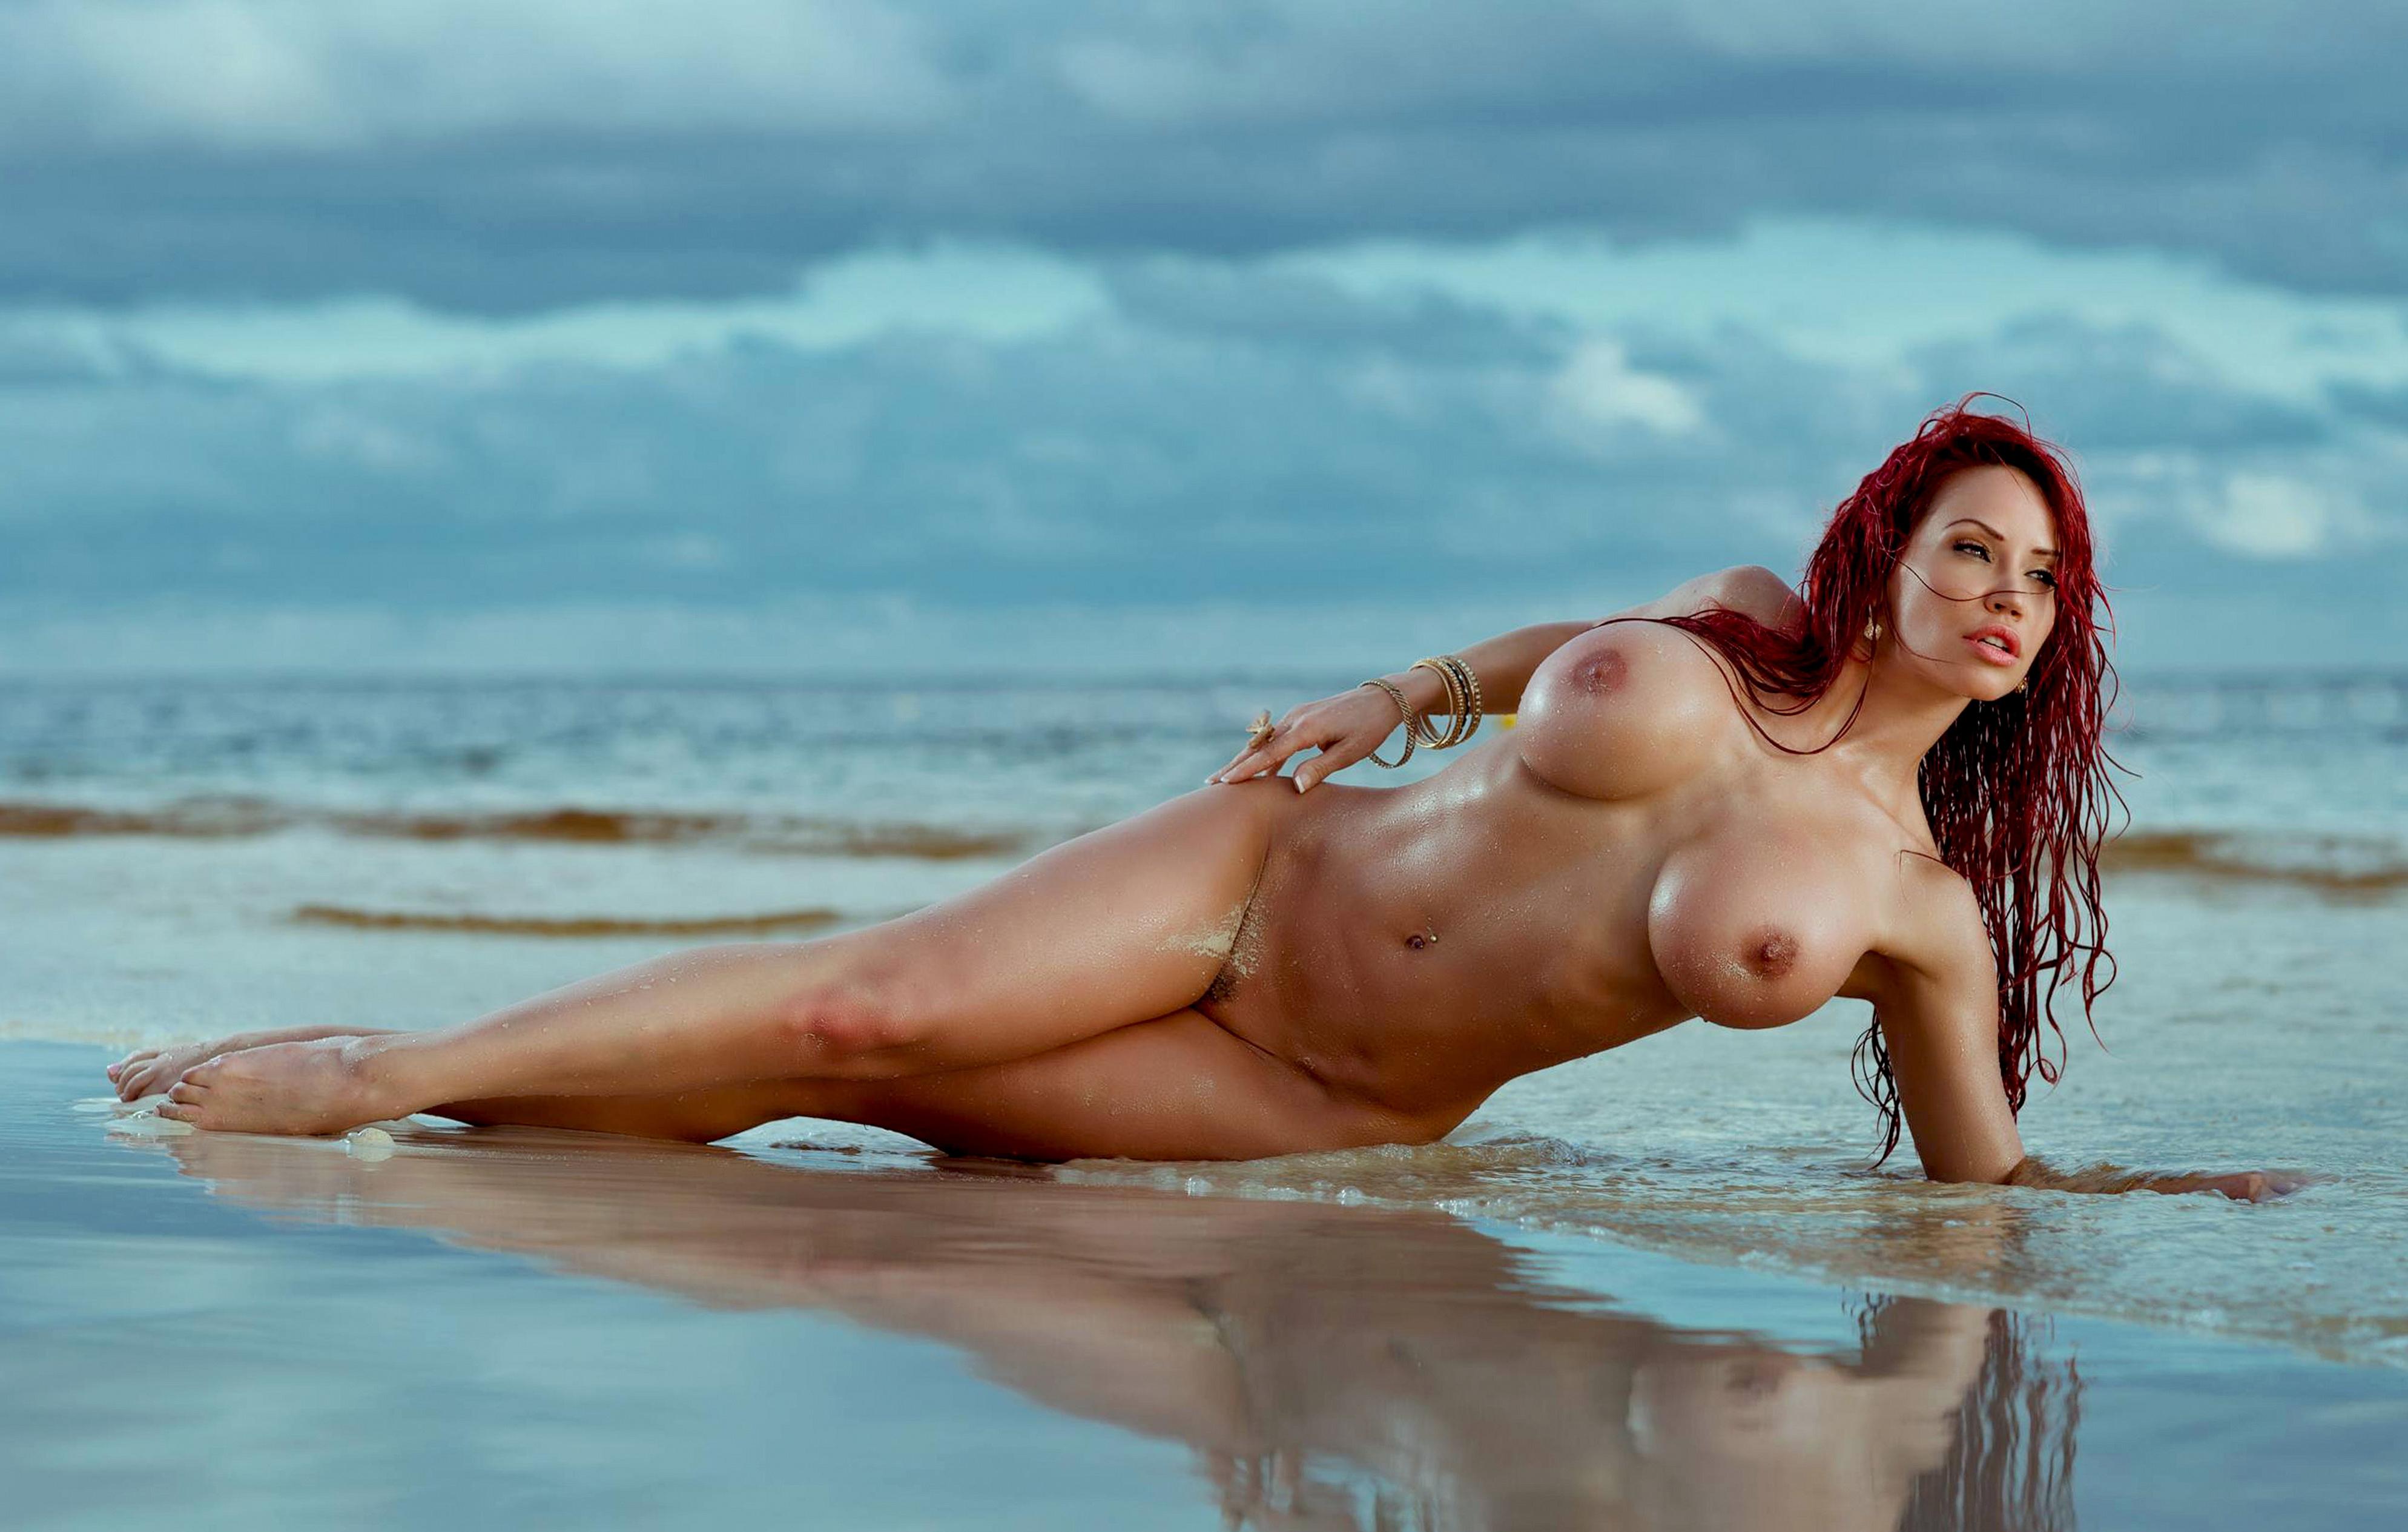 Bianca reese nude #9